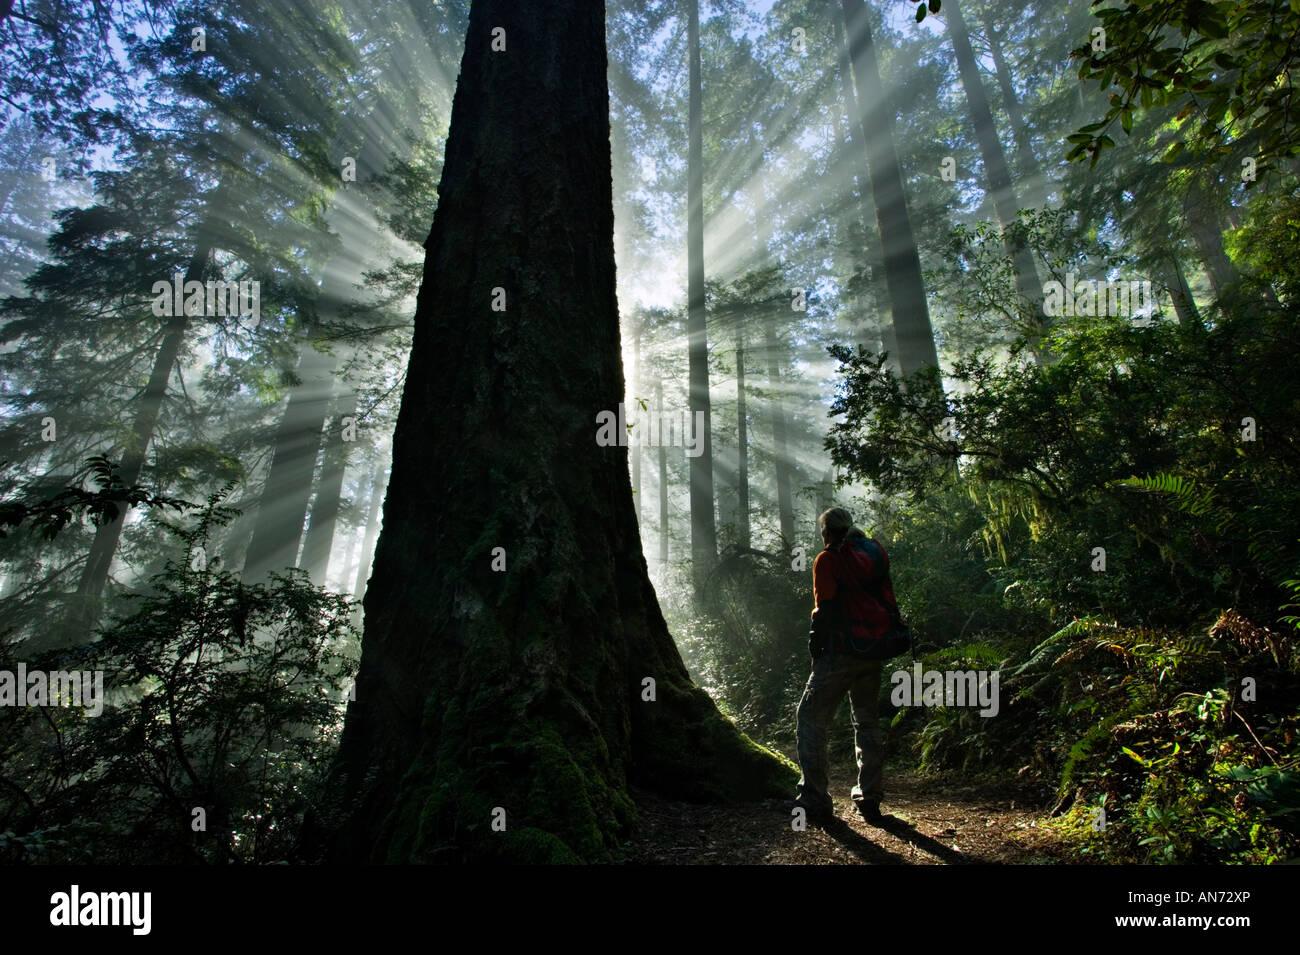 Woman hiking in mornig redwoods - Stock Image